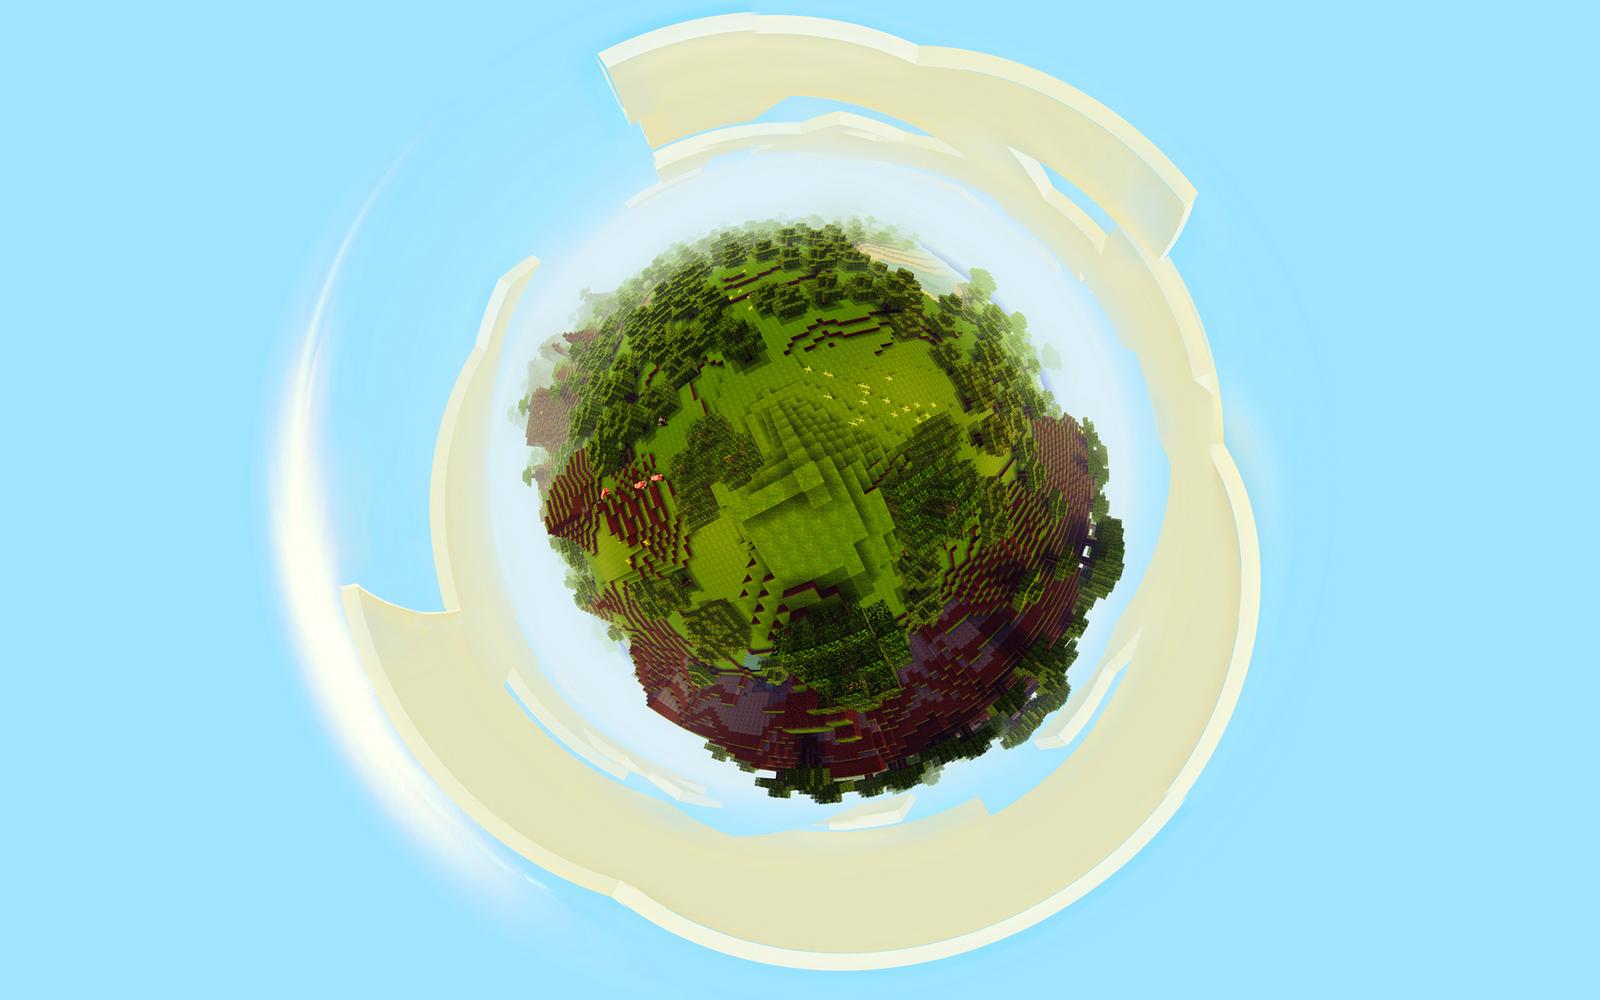 http://3.bp.blogspot.com/-cwYTF4VAEPU/TlUC1WOq5RI/AAAAAAAACuI/JdFRESb1Wqg/s1600/Minecraft_3D_HD_Wallpaper.png